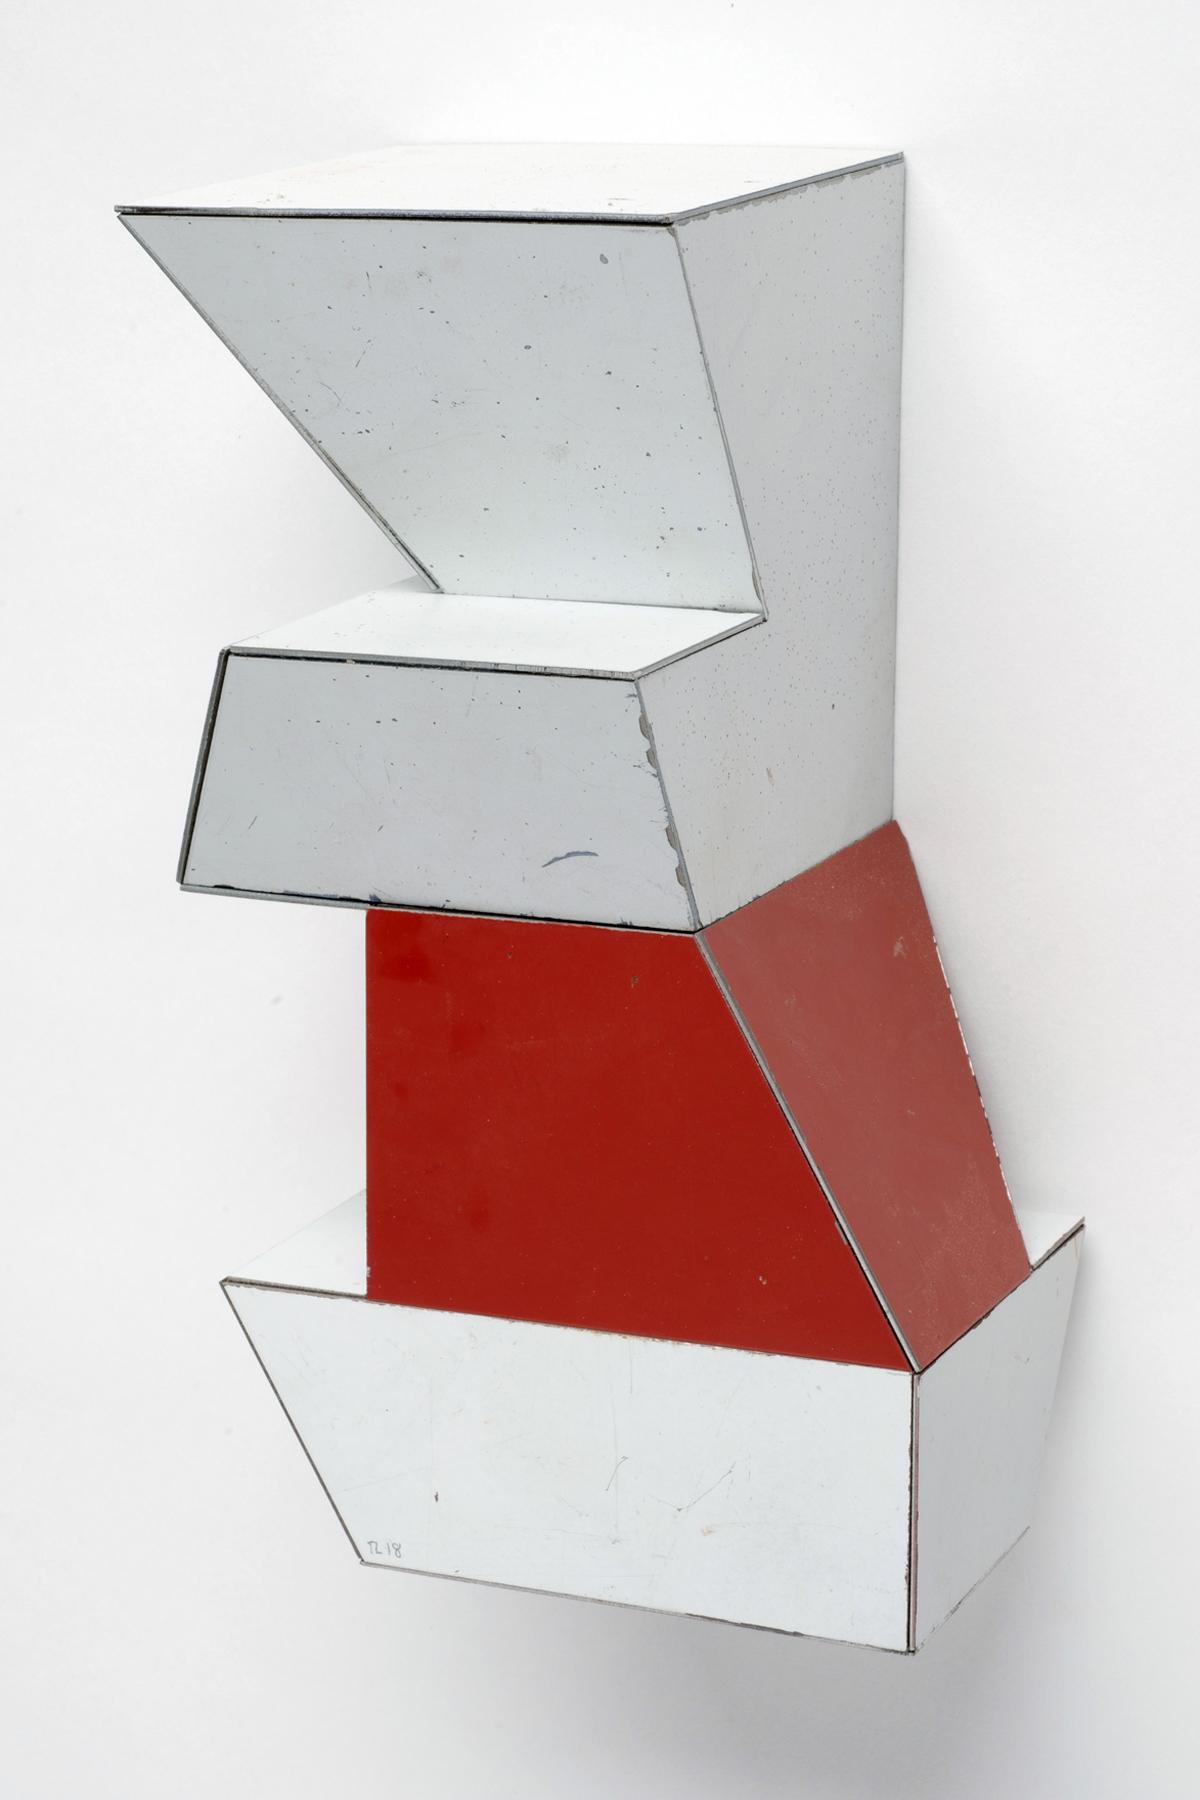 Fuzzy Logic, 7.5 x 4 x 4 inches / 19 x 10.2 x 10.2 cm, salvage steel, marine-grade plywood, silicone, vulcanized rubber, hardware, 2018